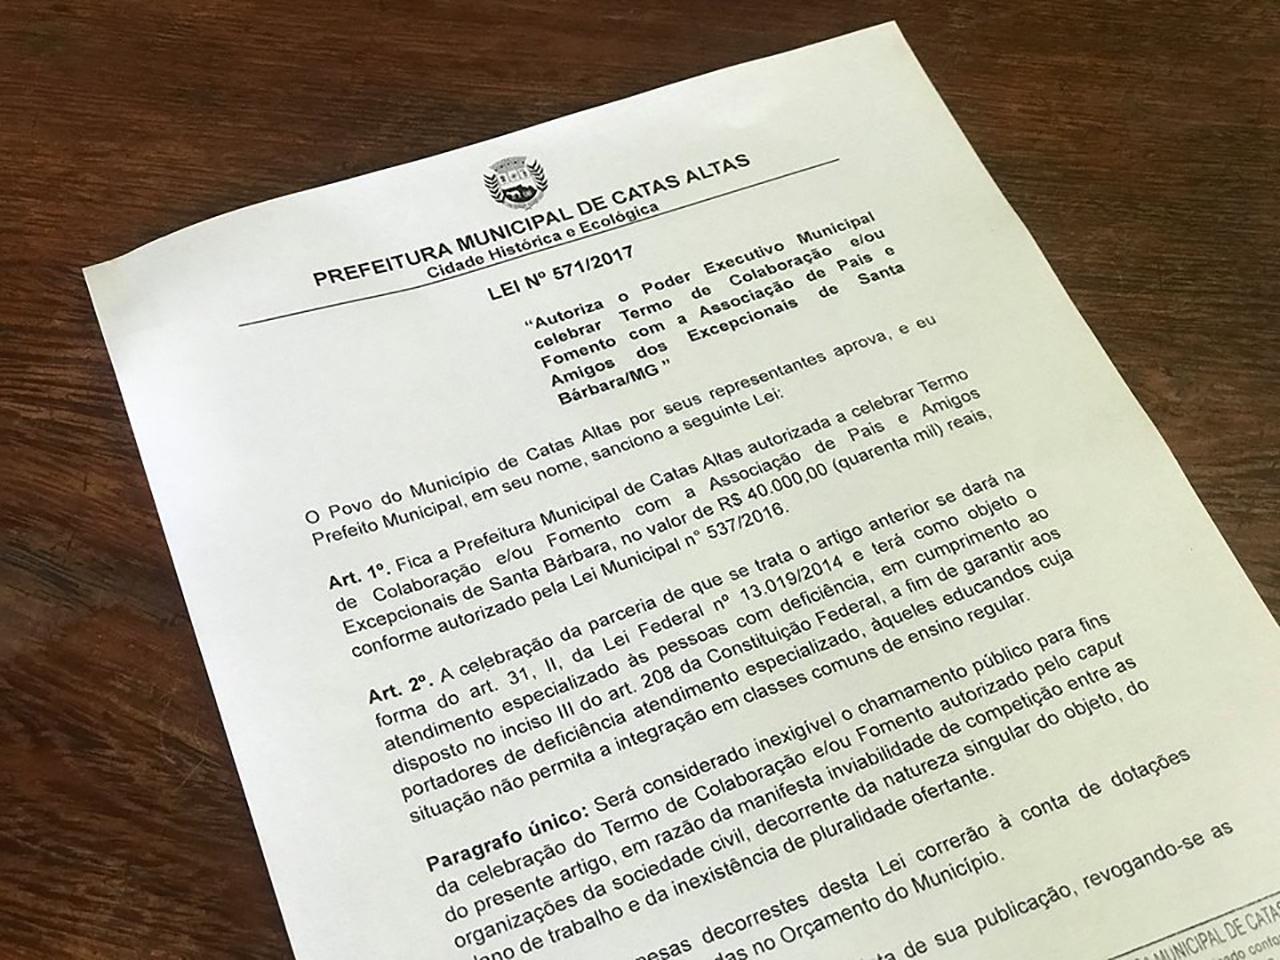 Sancionada lei que autoriza prefeitura de Catas Altas a repassar recurso à Apae